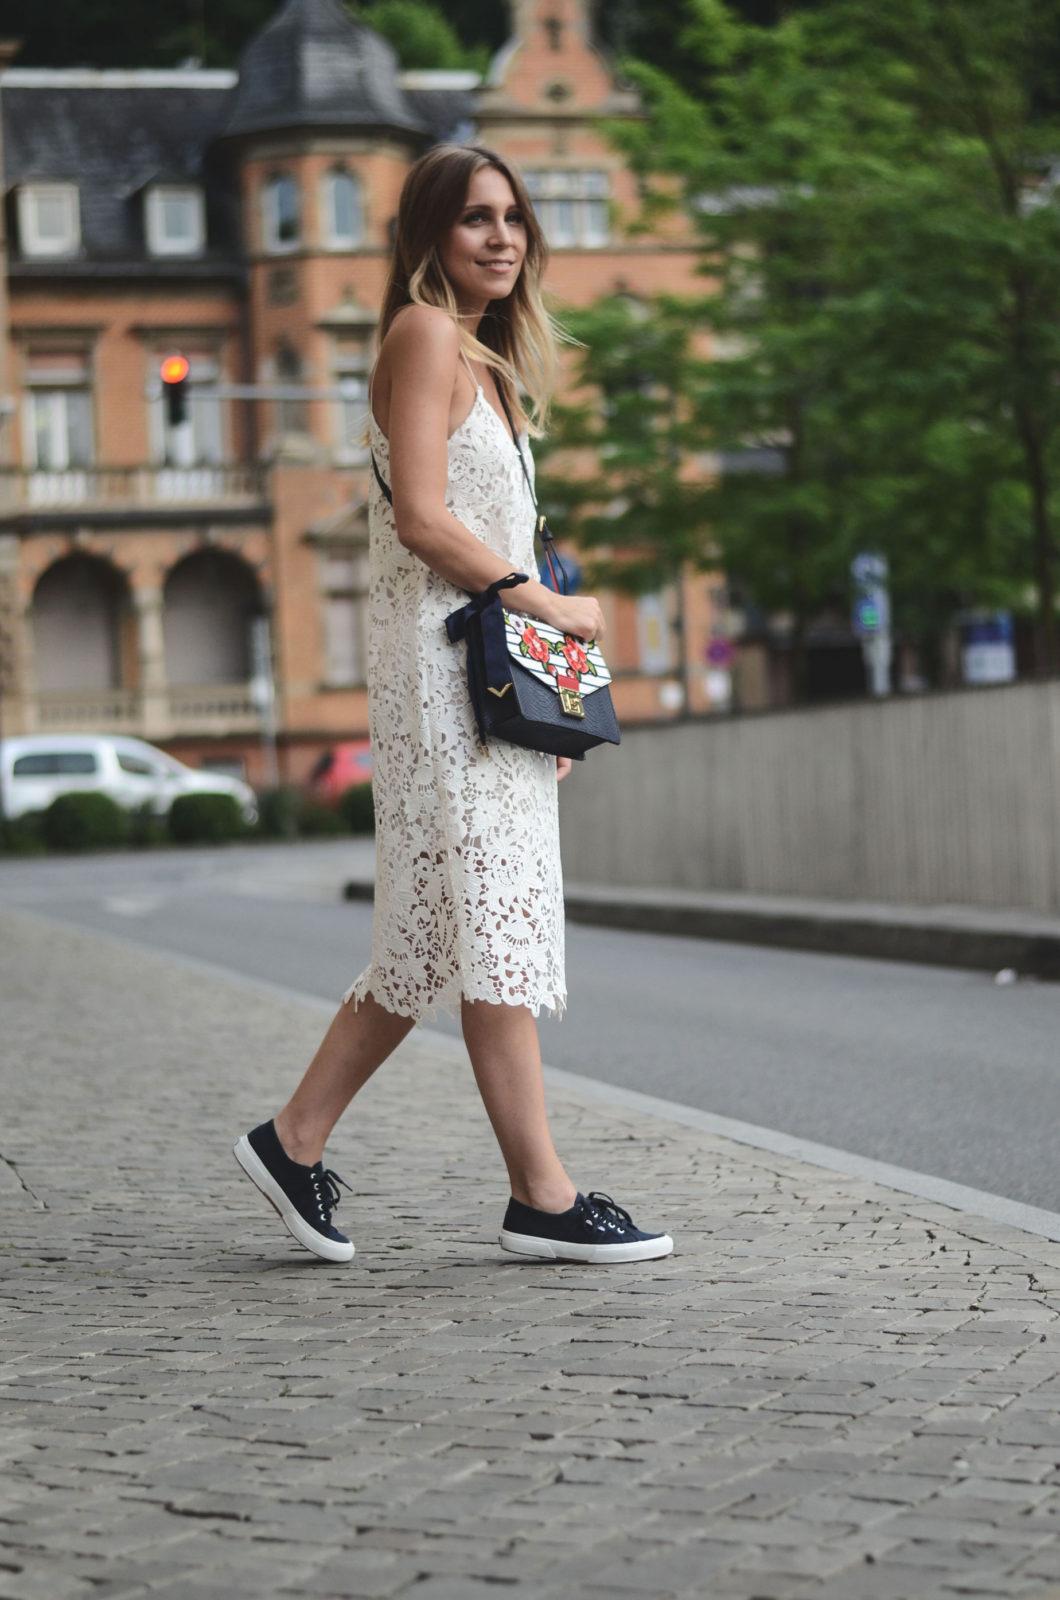 Sariety-modeblog-heidelberg-sarah-czok-fashionblogger-zara-spitzenkleid-superga-aldo-bag-4